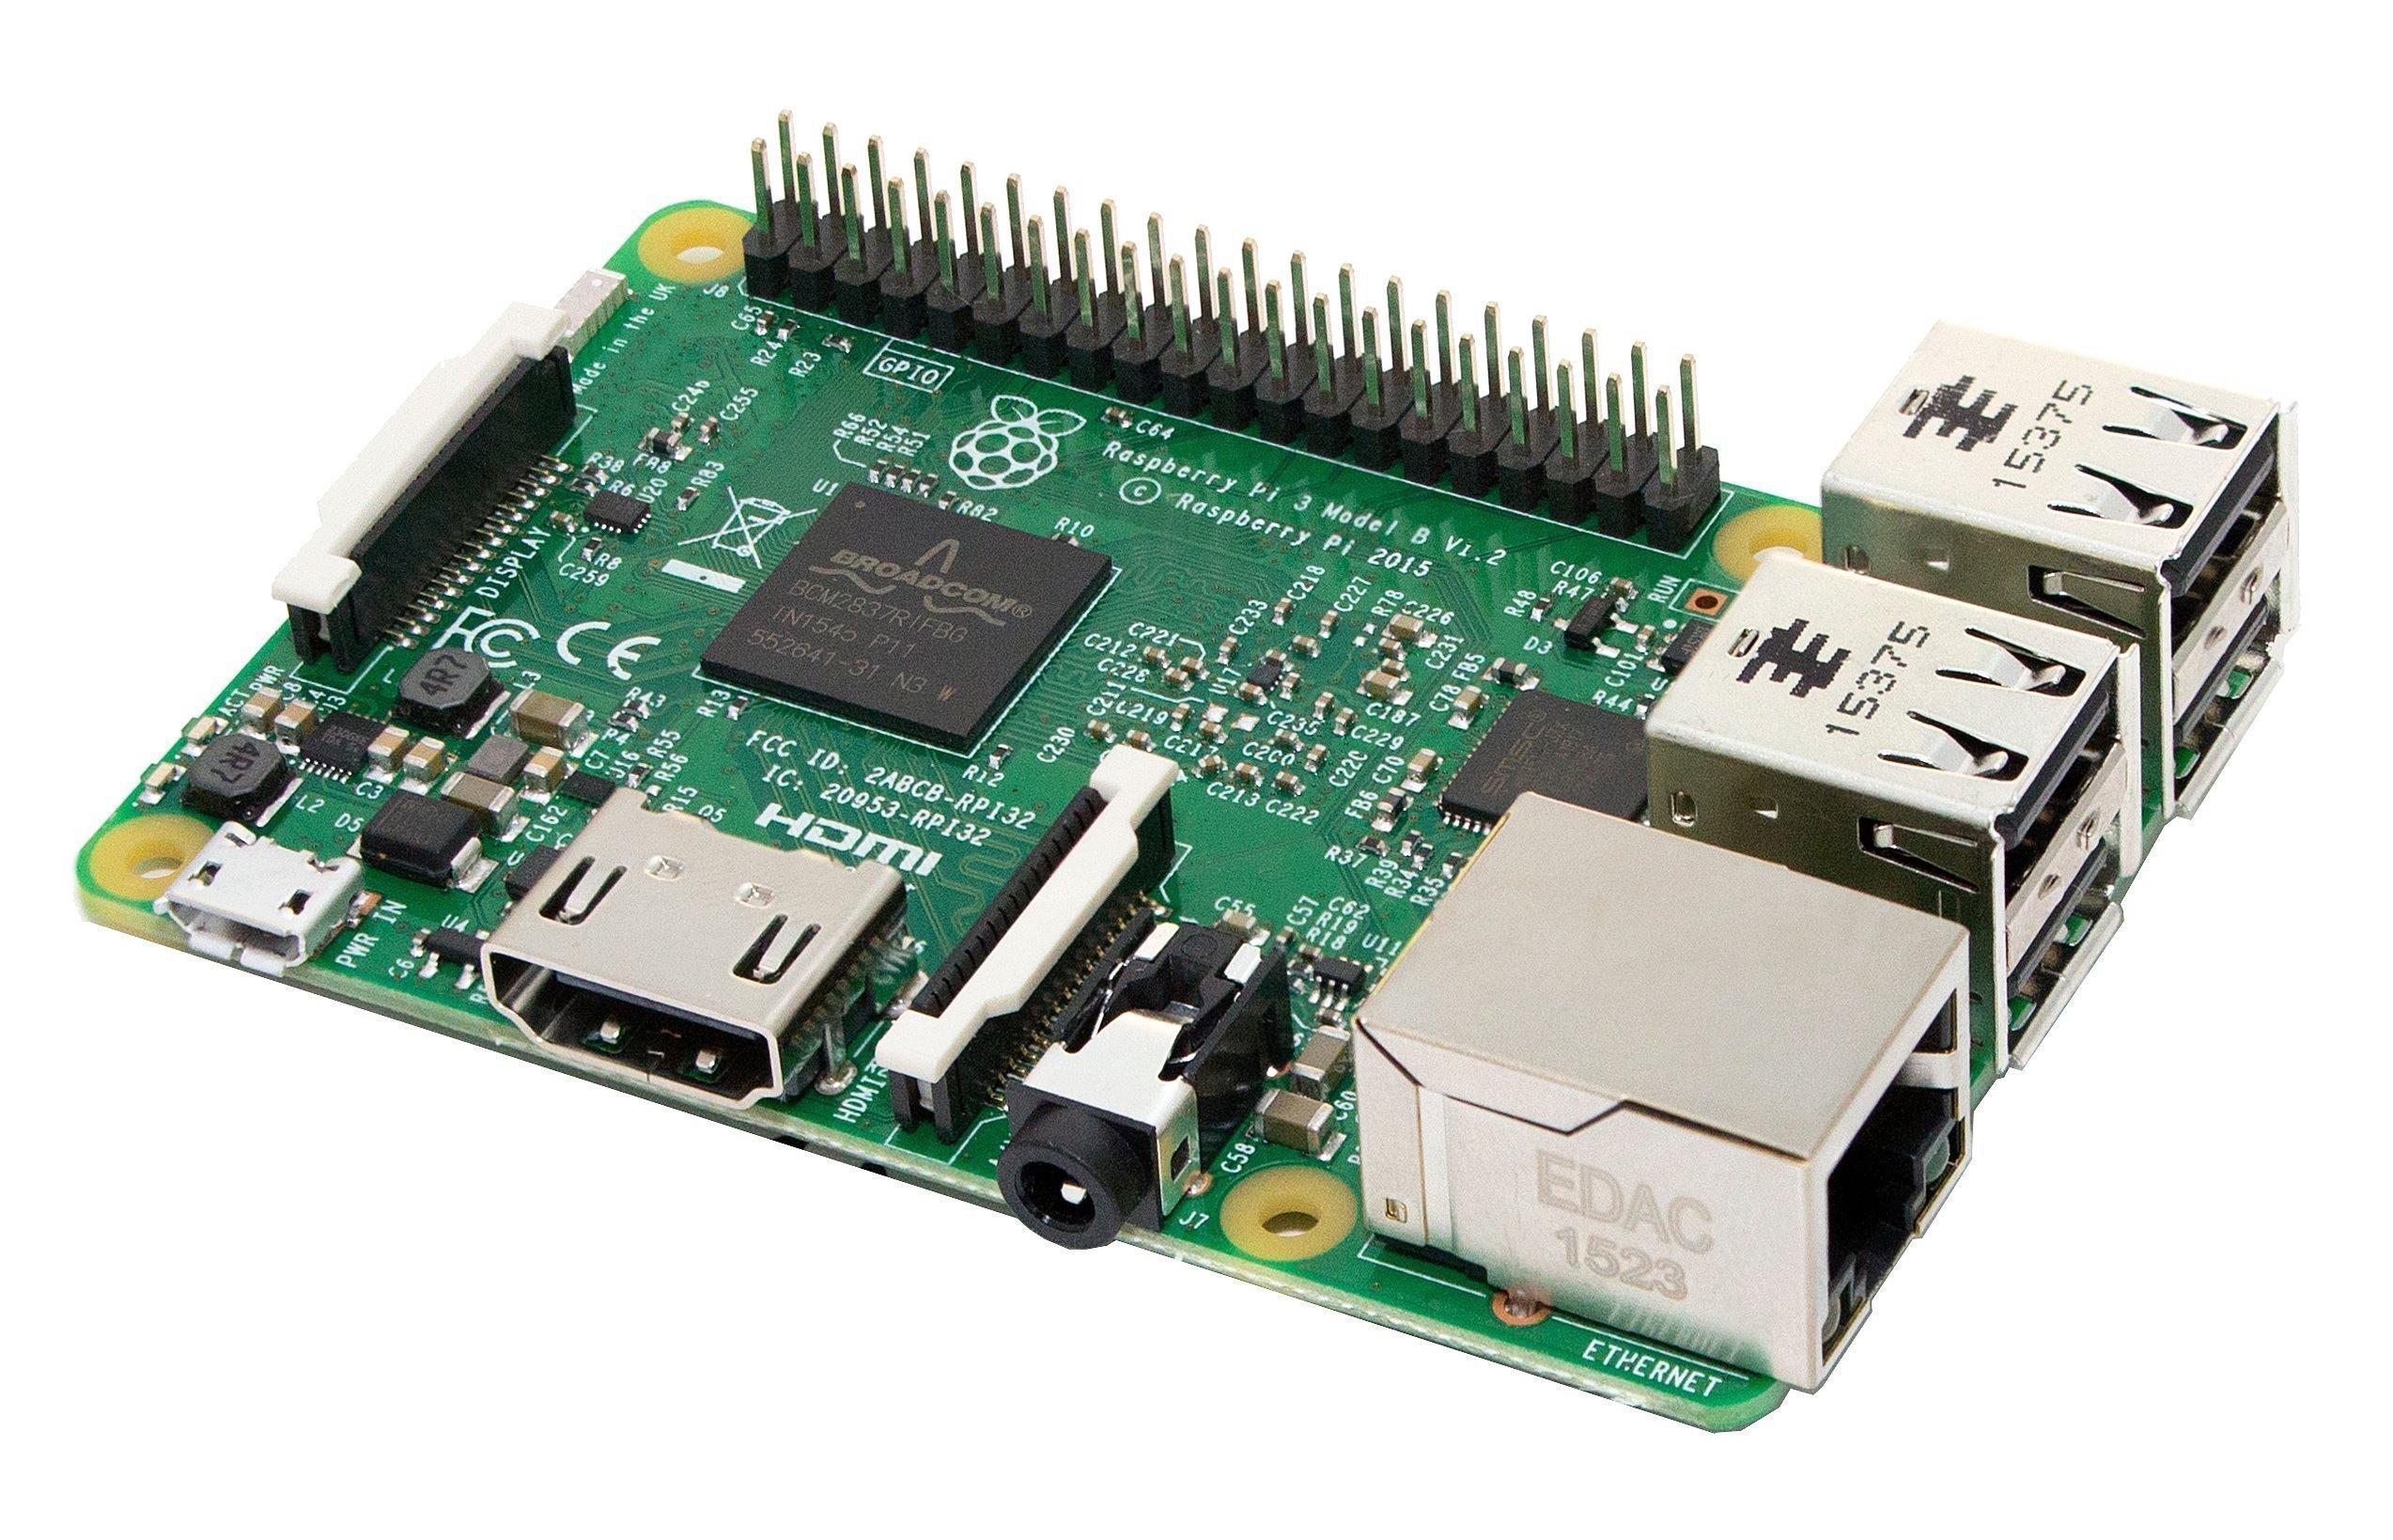 Raspberry Pi 3 Modelo B - Placa base (1.2 GHz Quad-core ARM Cortex